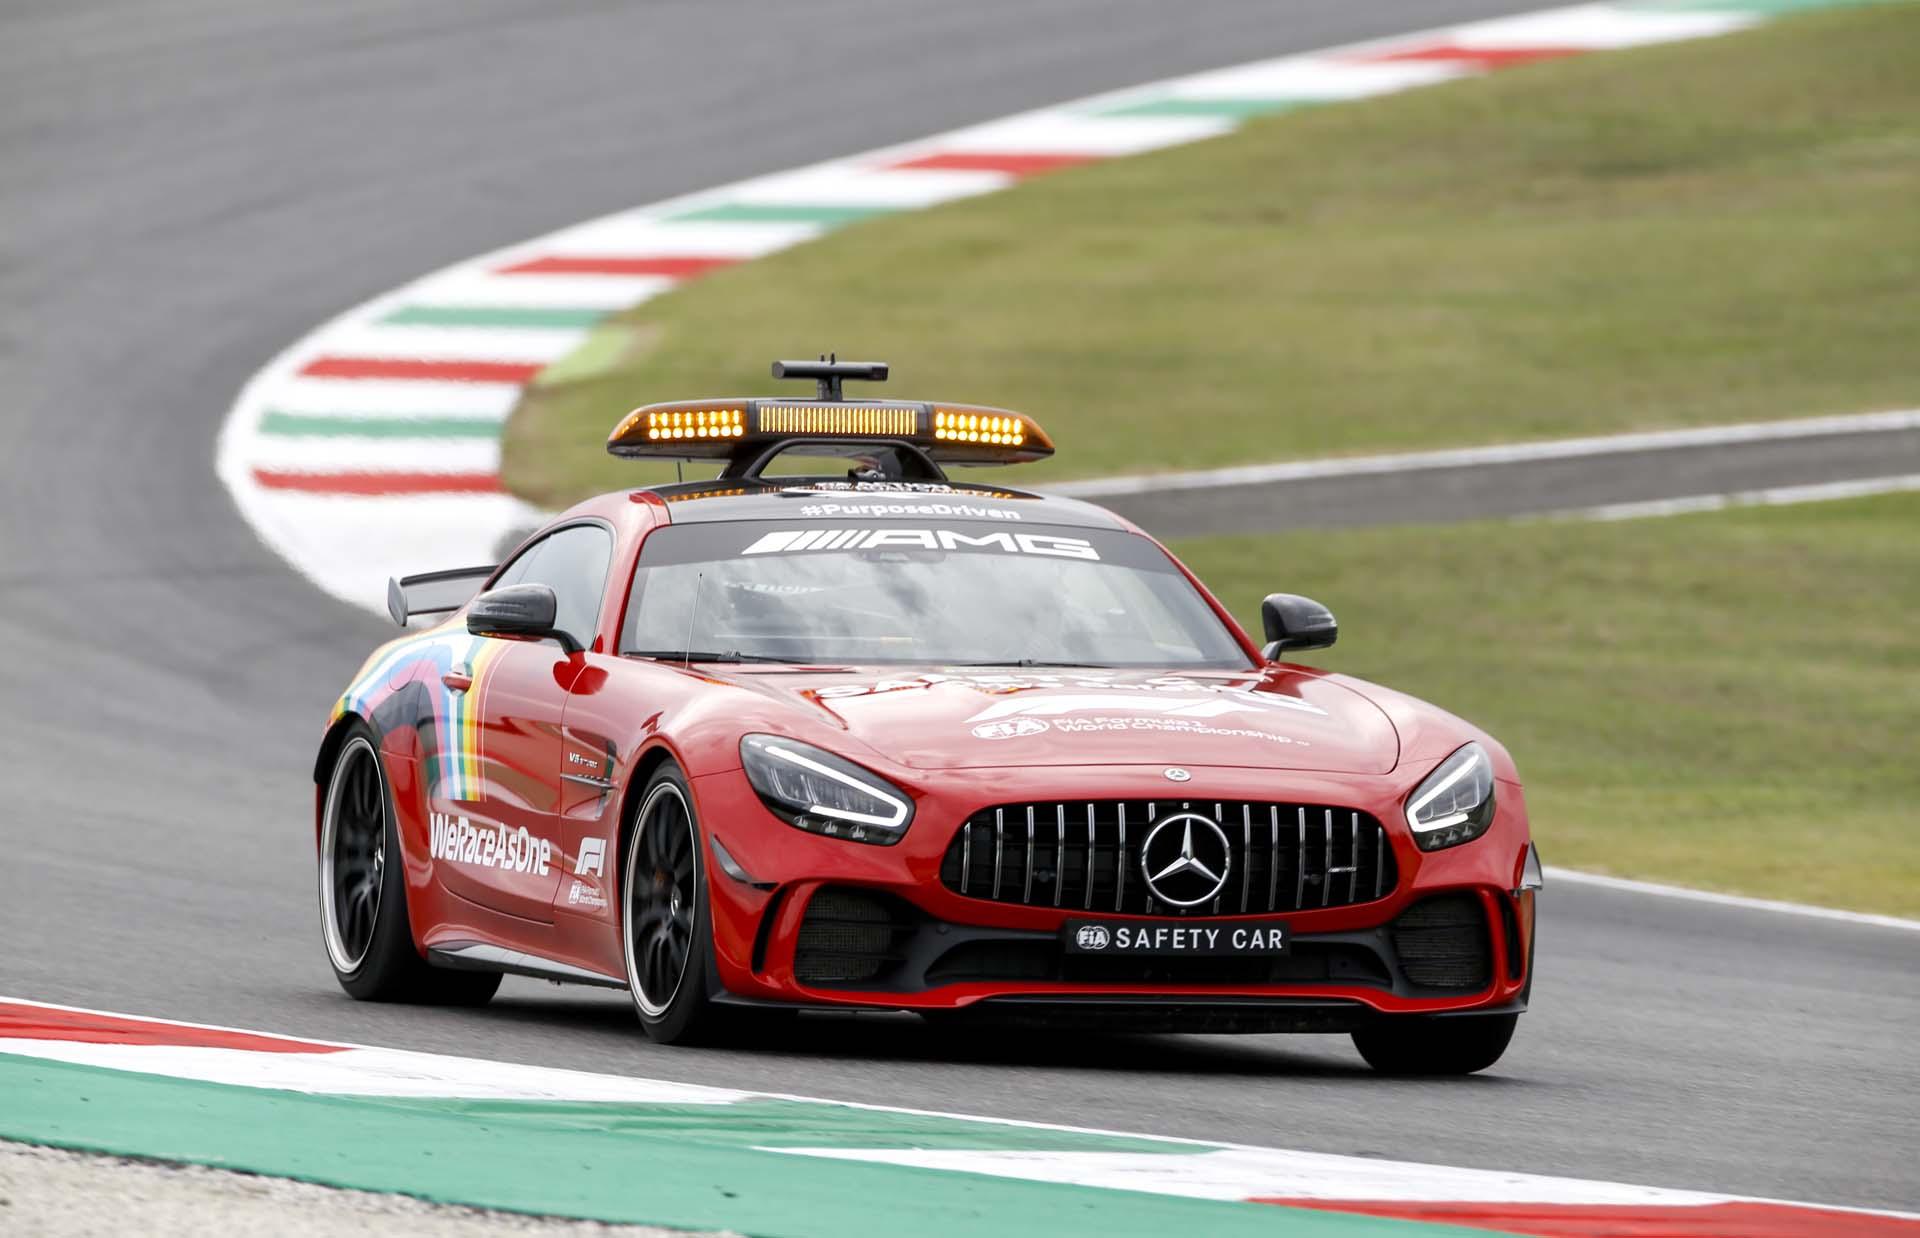 2020 Tuscan Grand Prix, Friday - Wolfgang Wilhelm